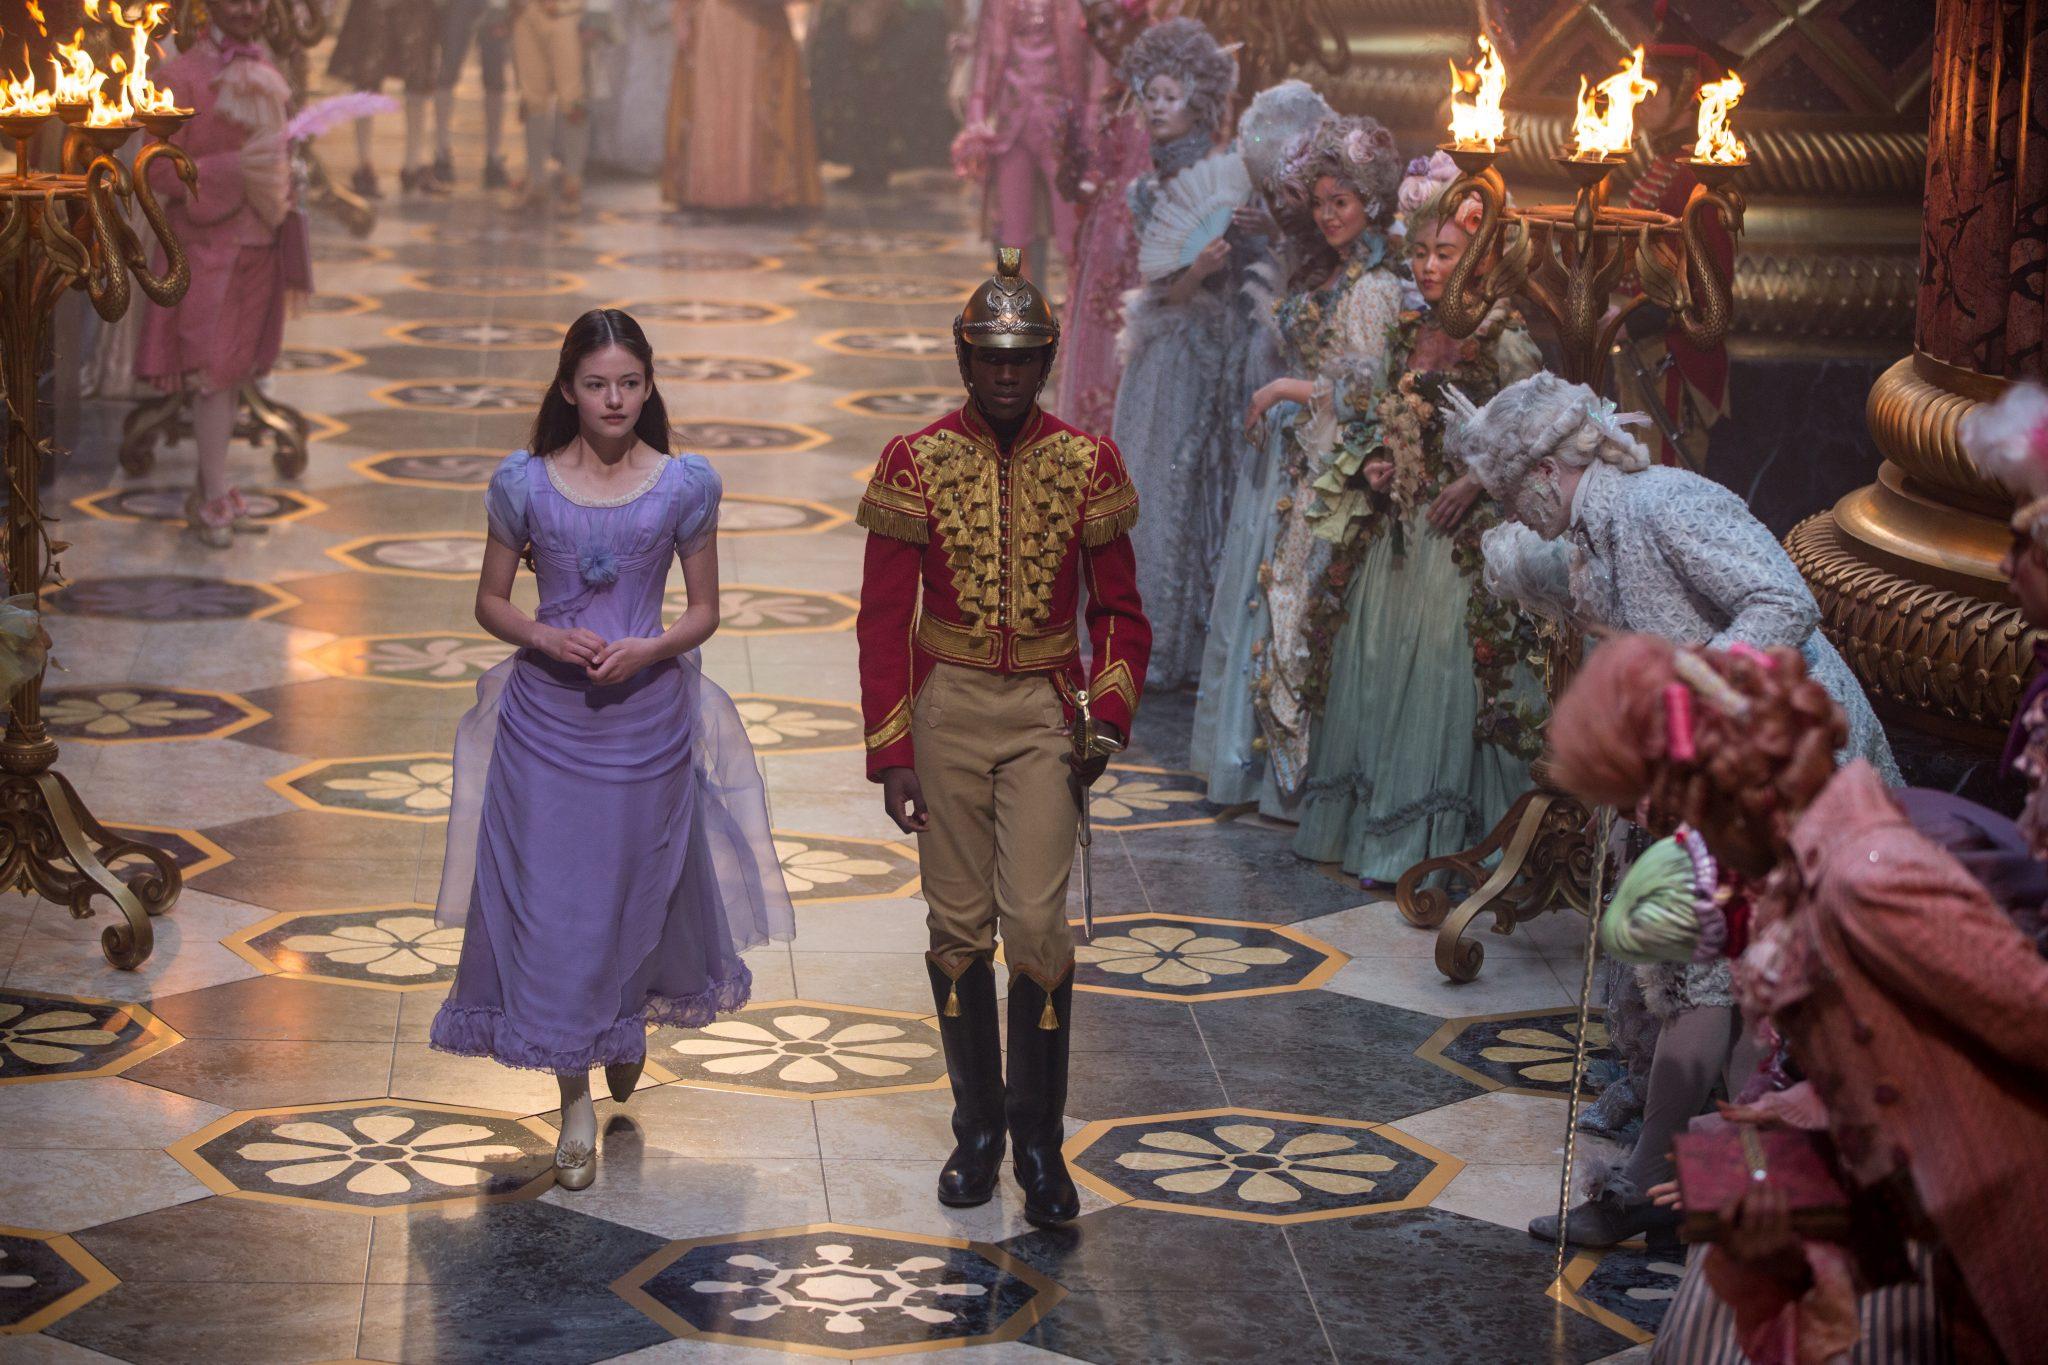 New Movie: Disney's THE NUTCRACKER AND THE FOUR REALMS